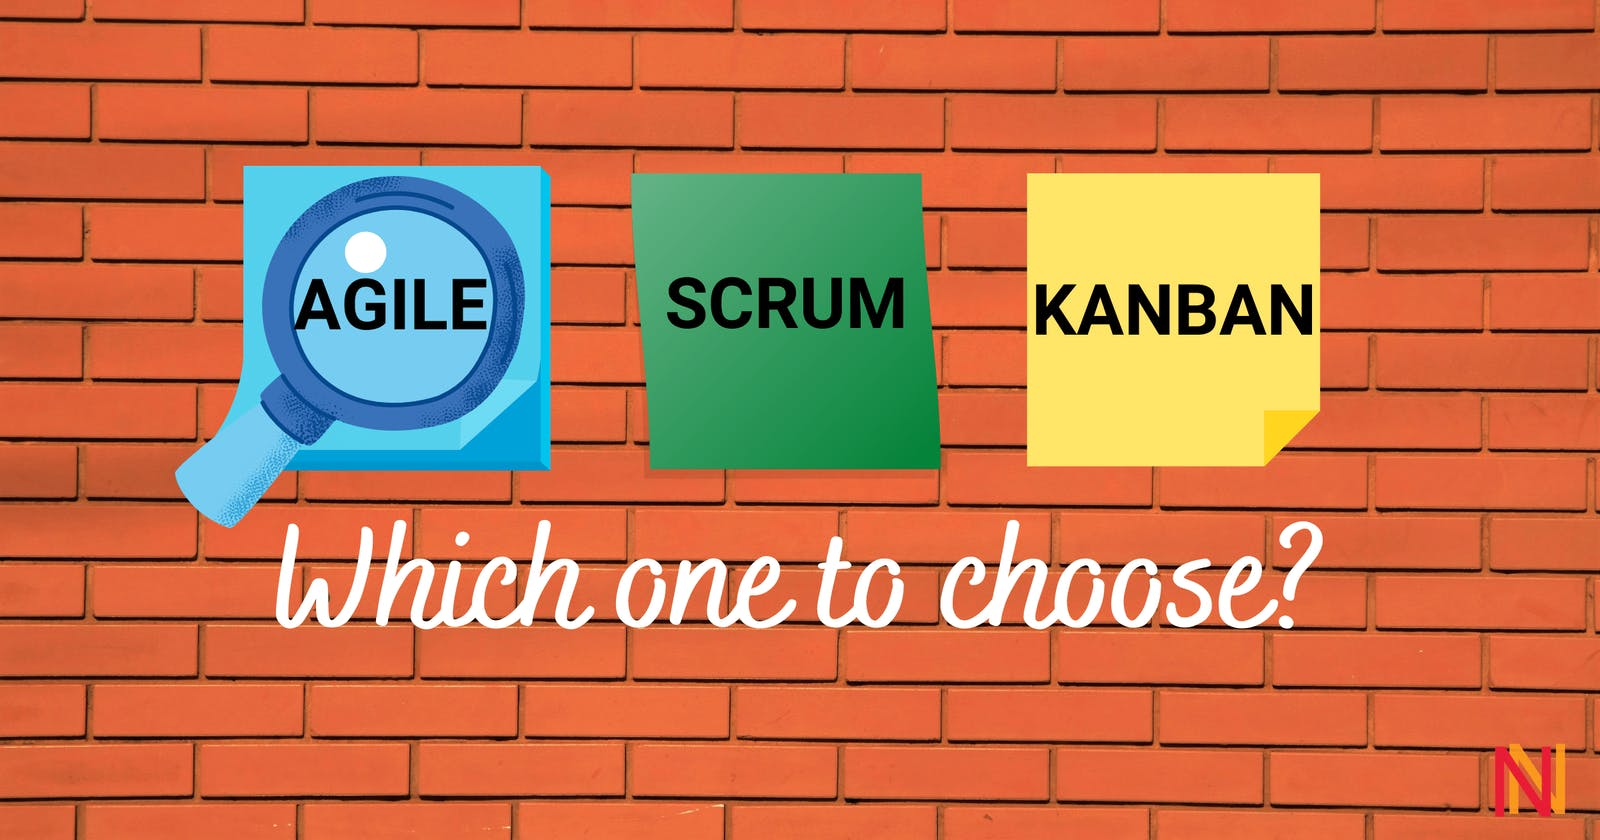 What does Agile, Scrum & Kanban mean?